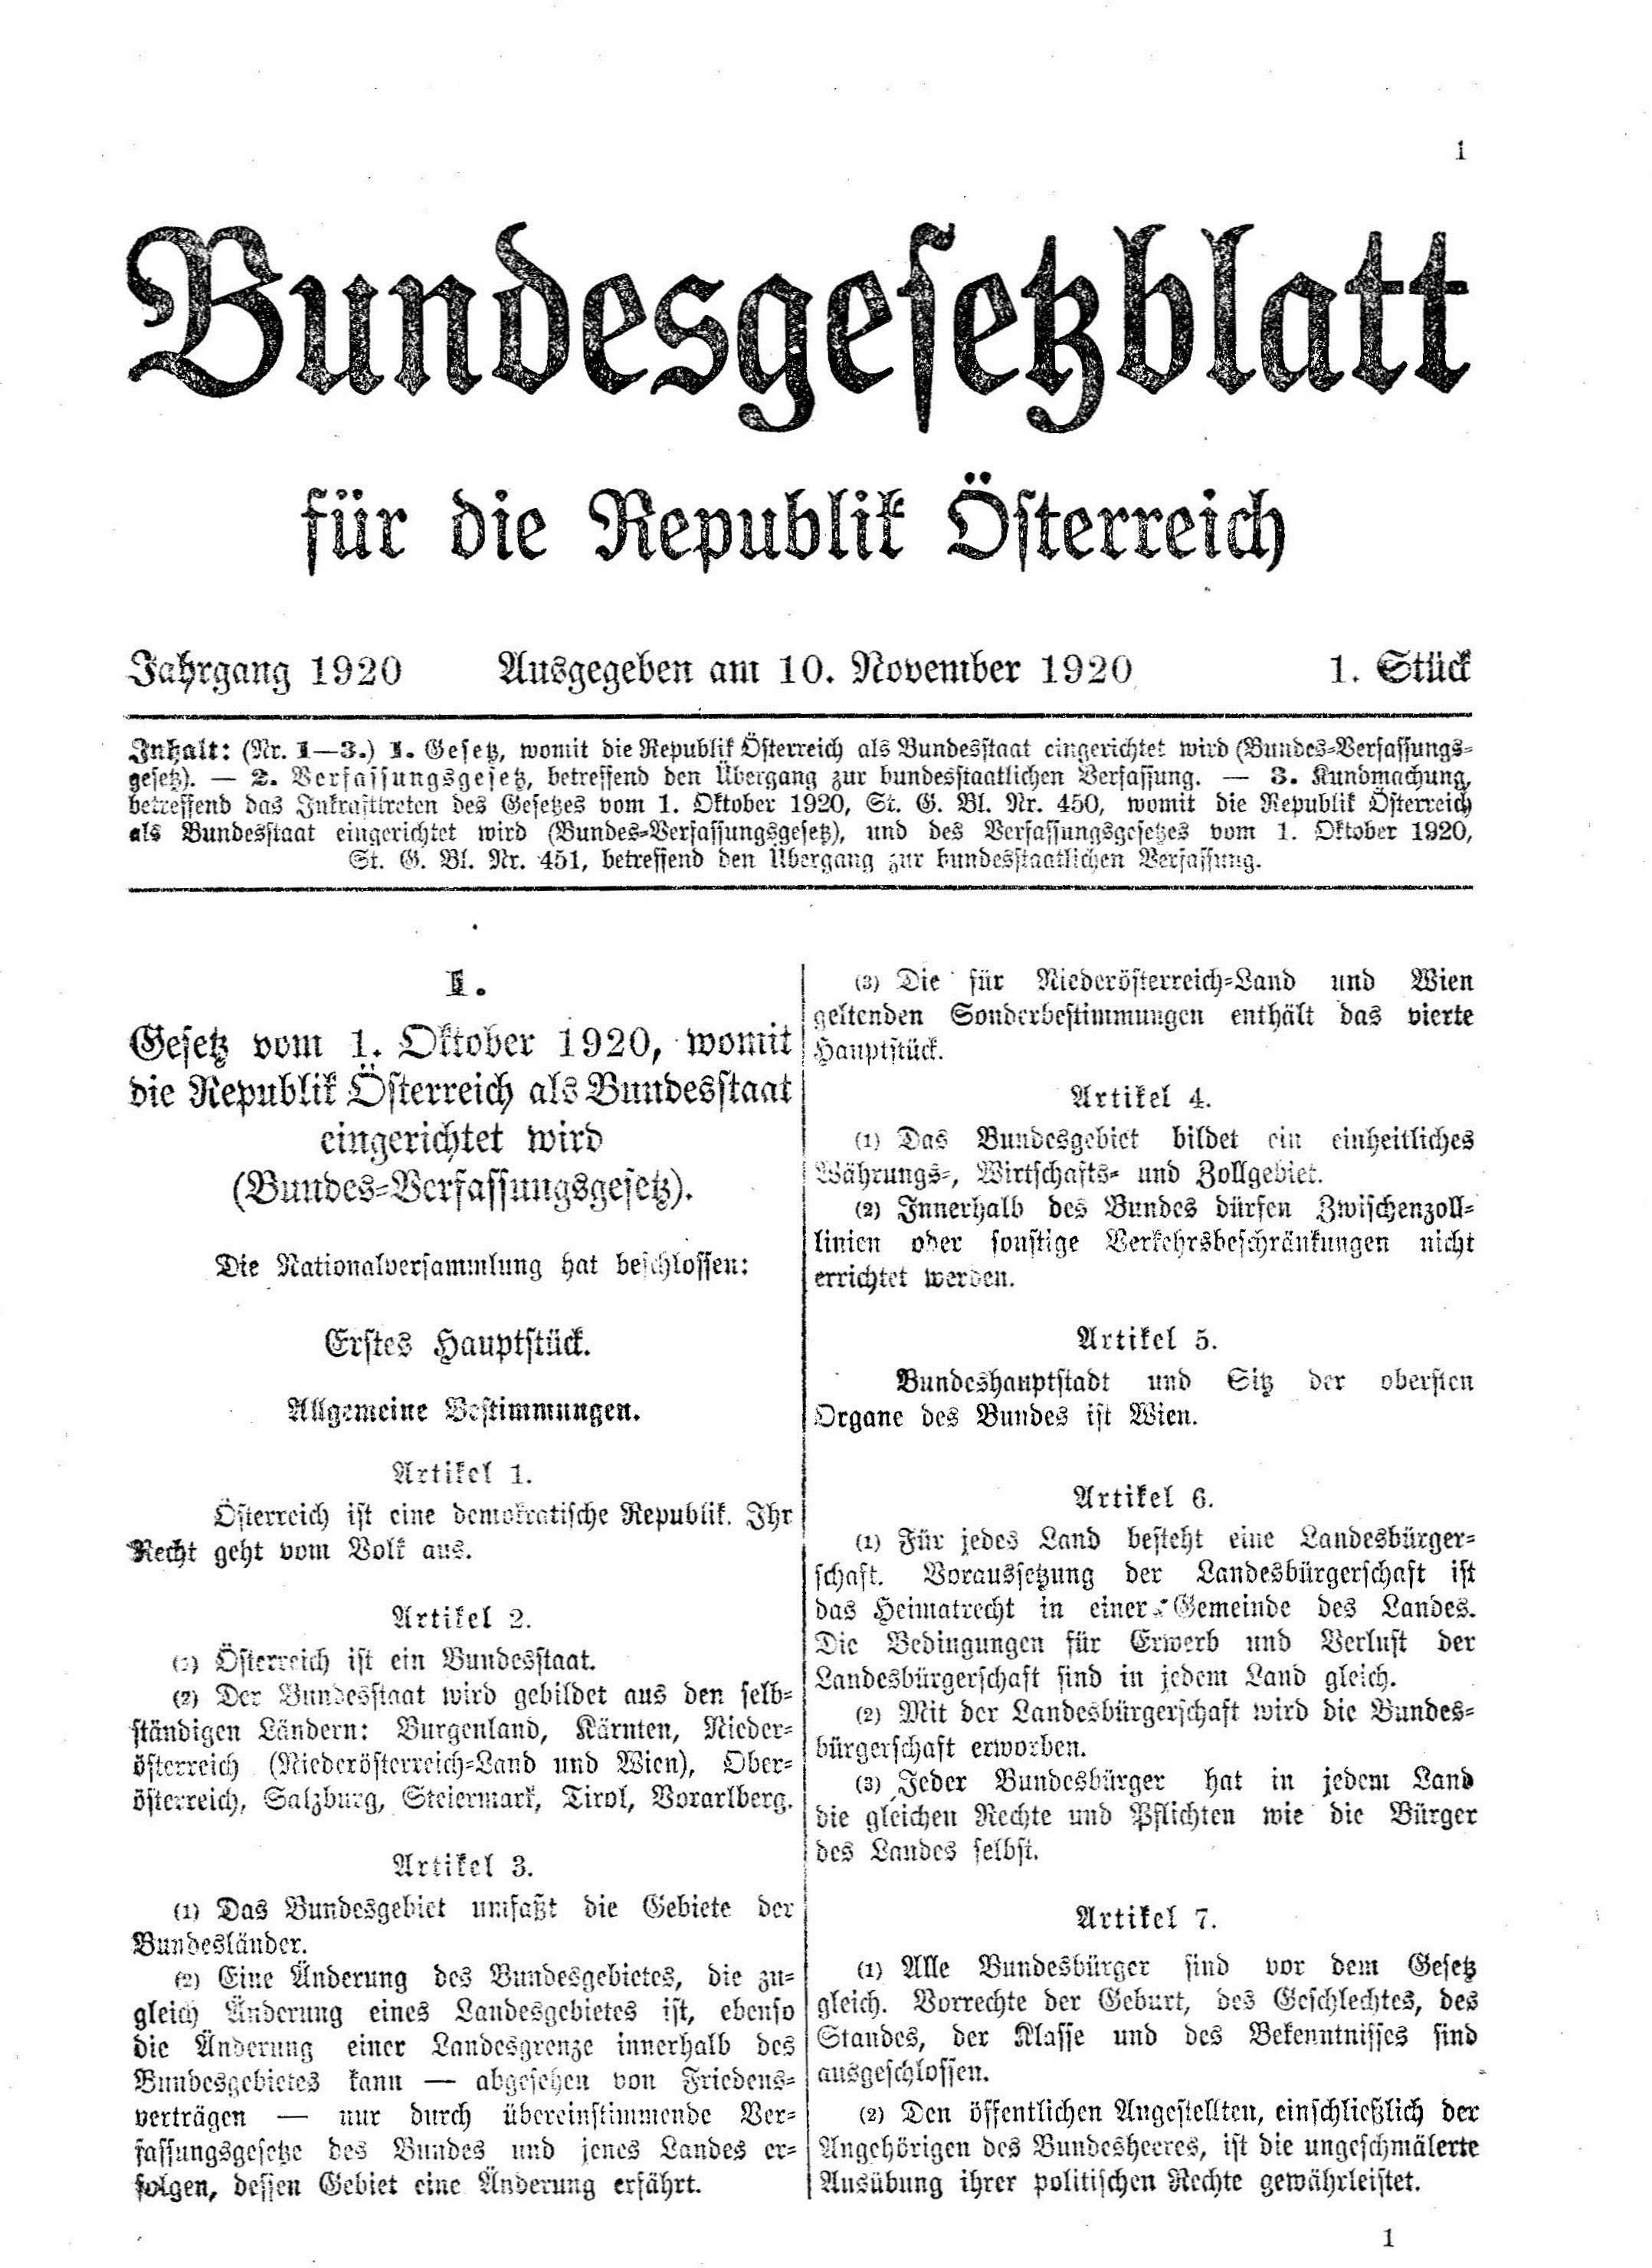 http://upload.wikimedia.org/wikipedia/commons/c/cc/Bundesgesetzblatt_%28Austria%29_1920_0001.jpg